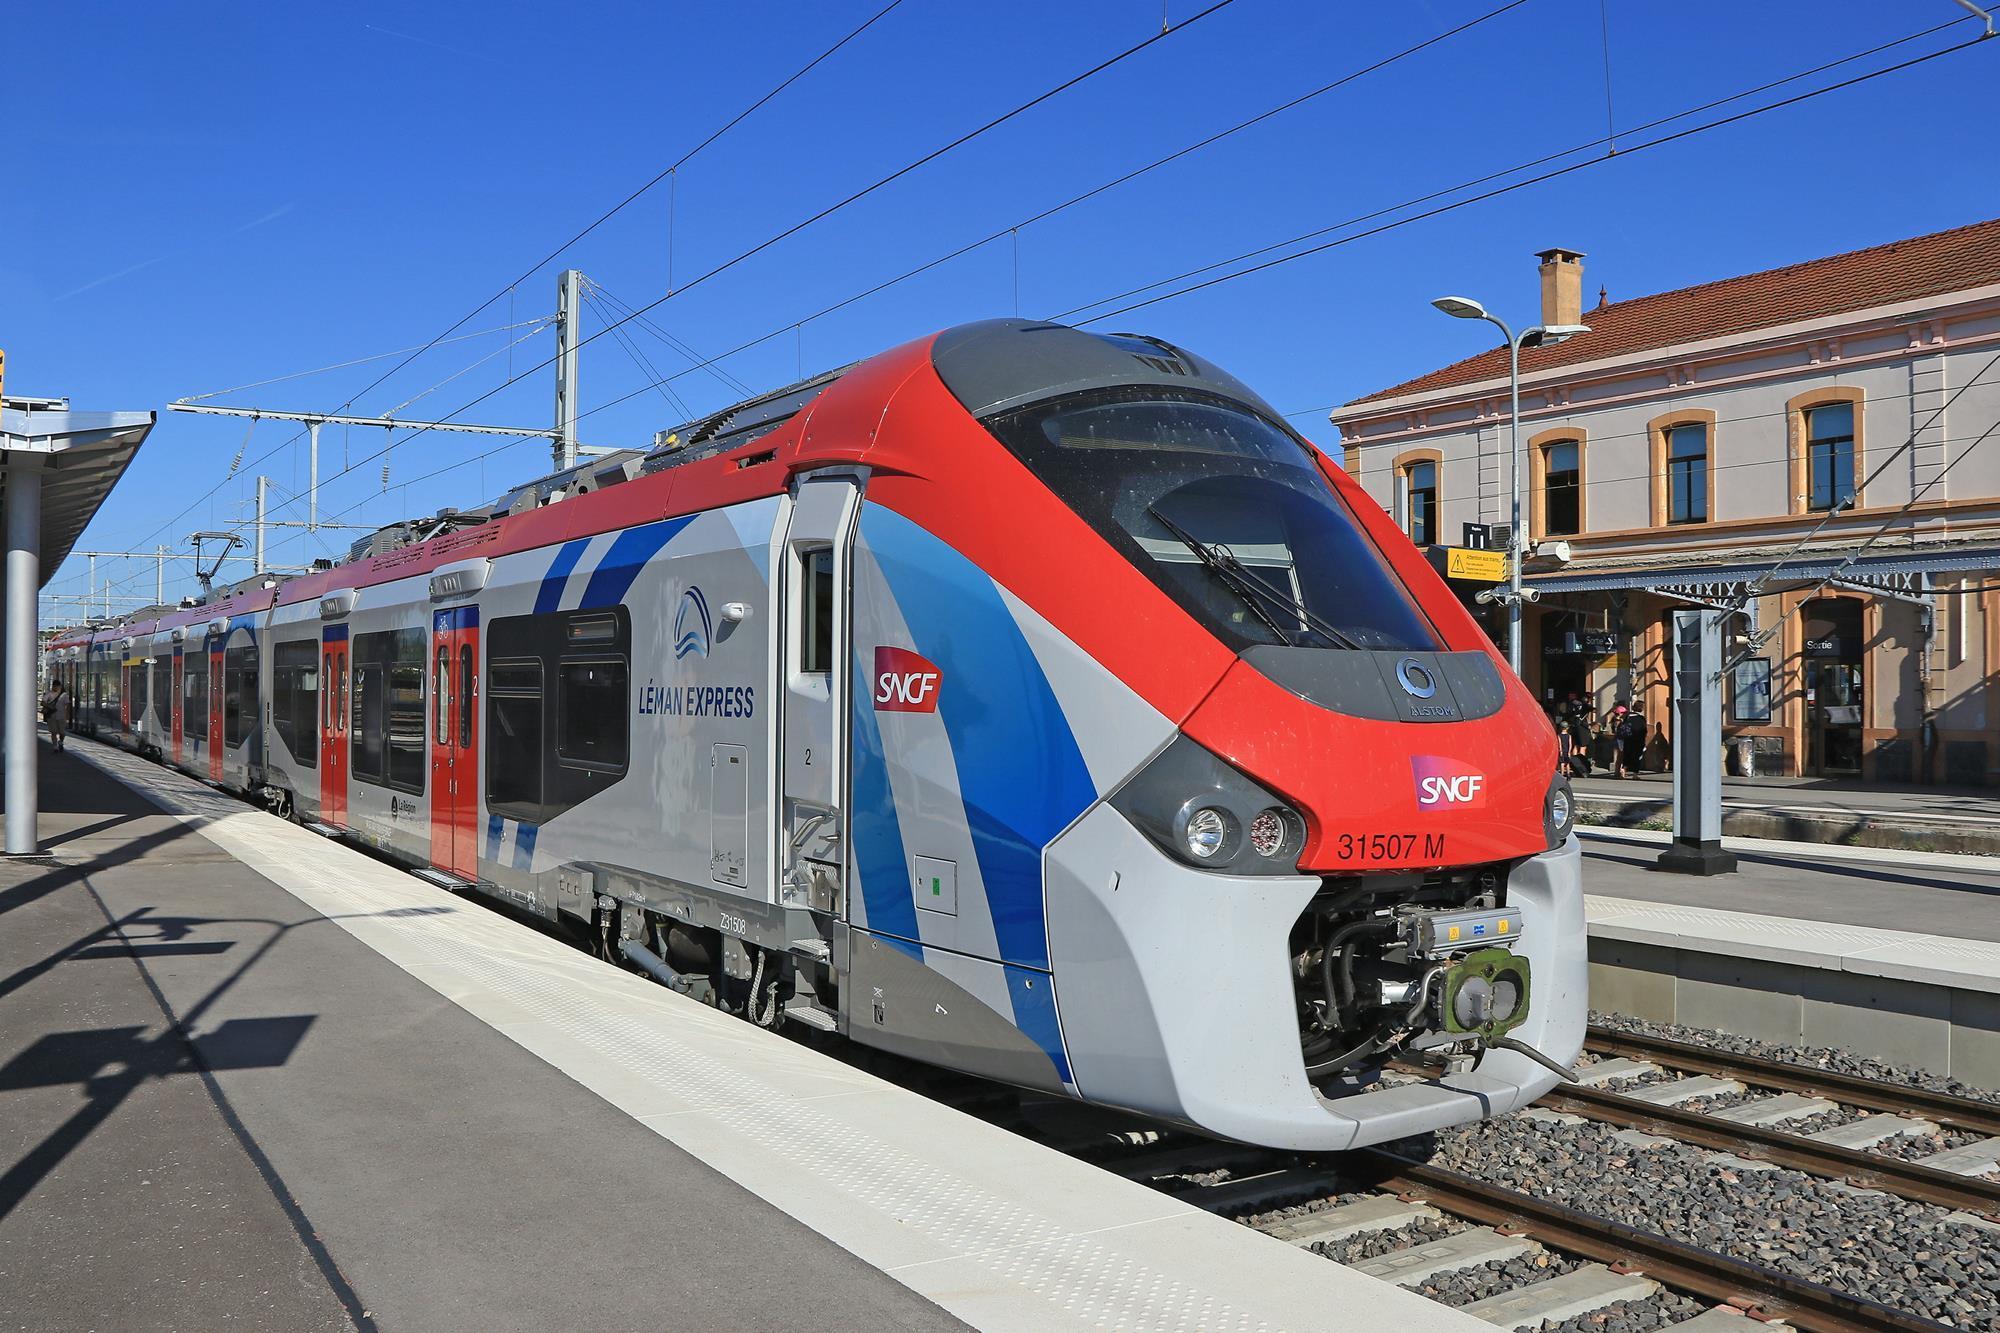 Diesel-hydraulic locomotive developed | News | Railway